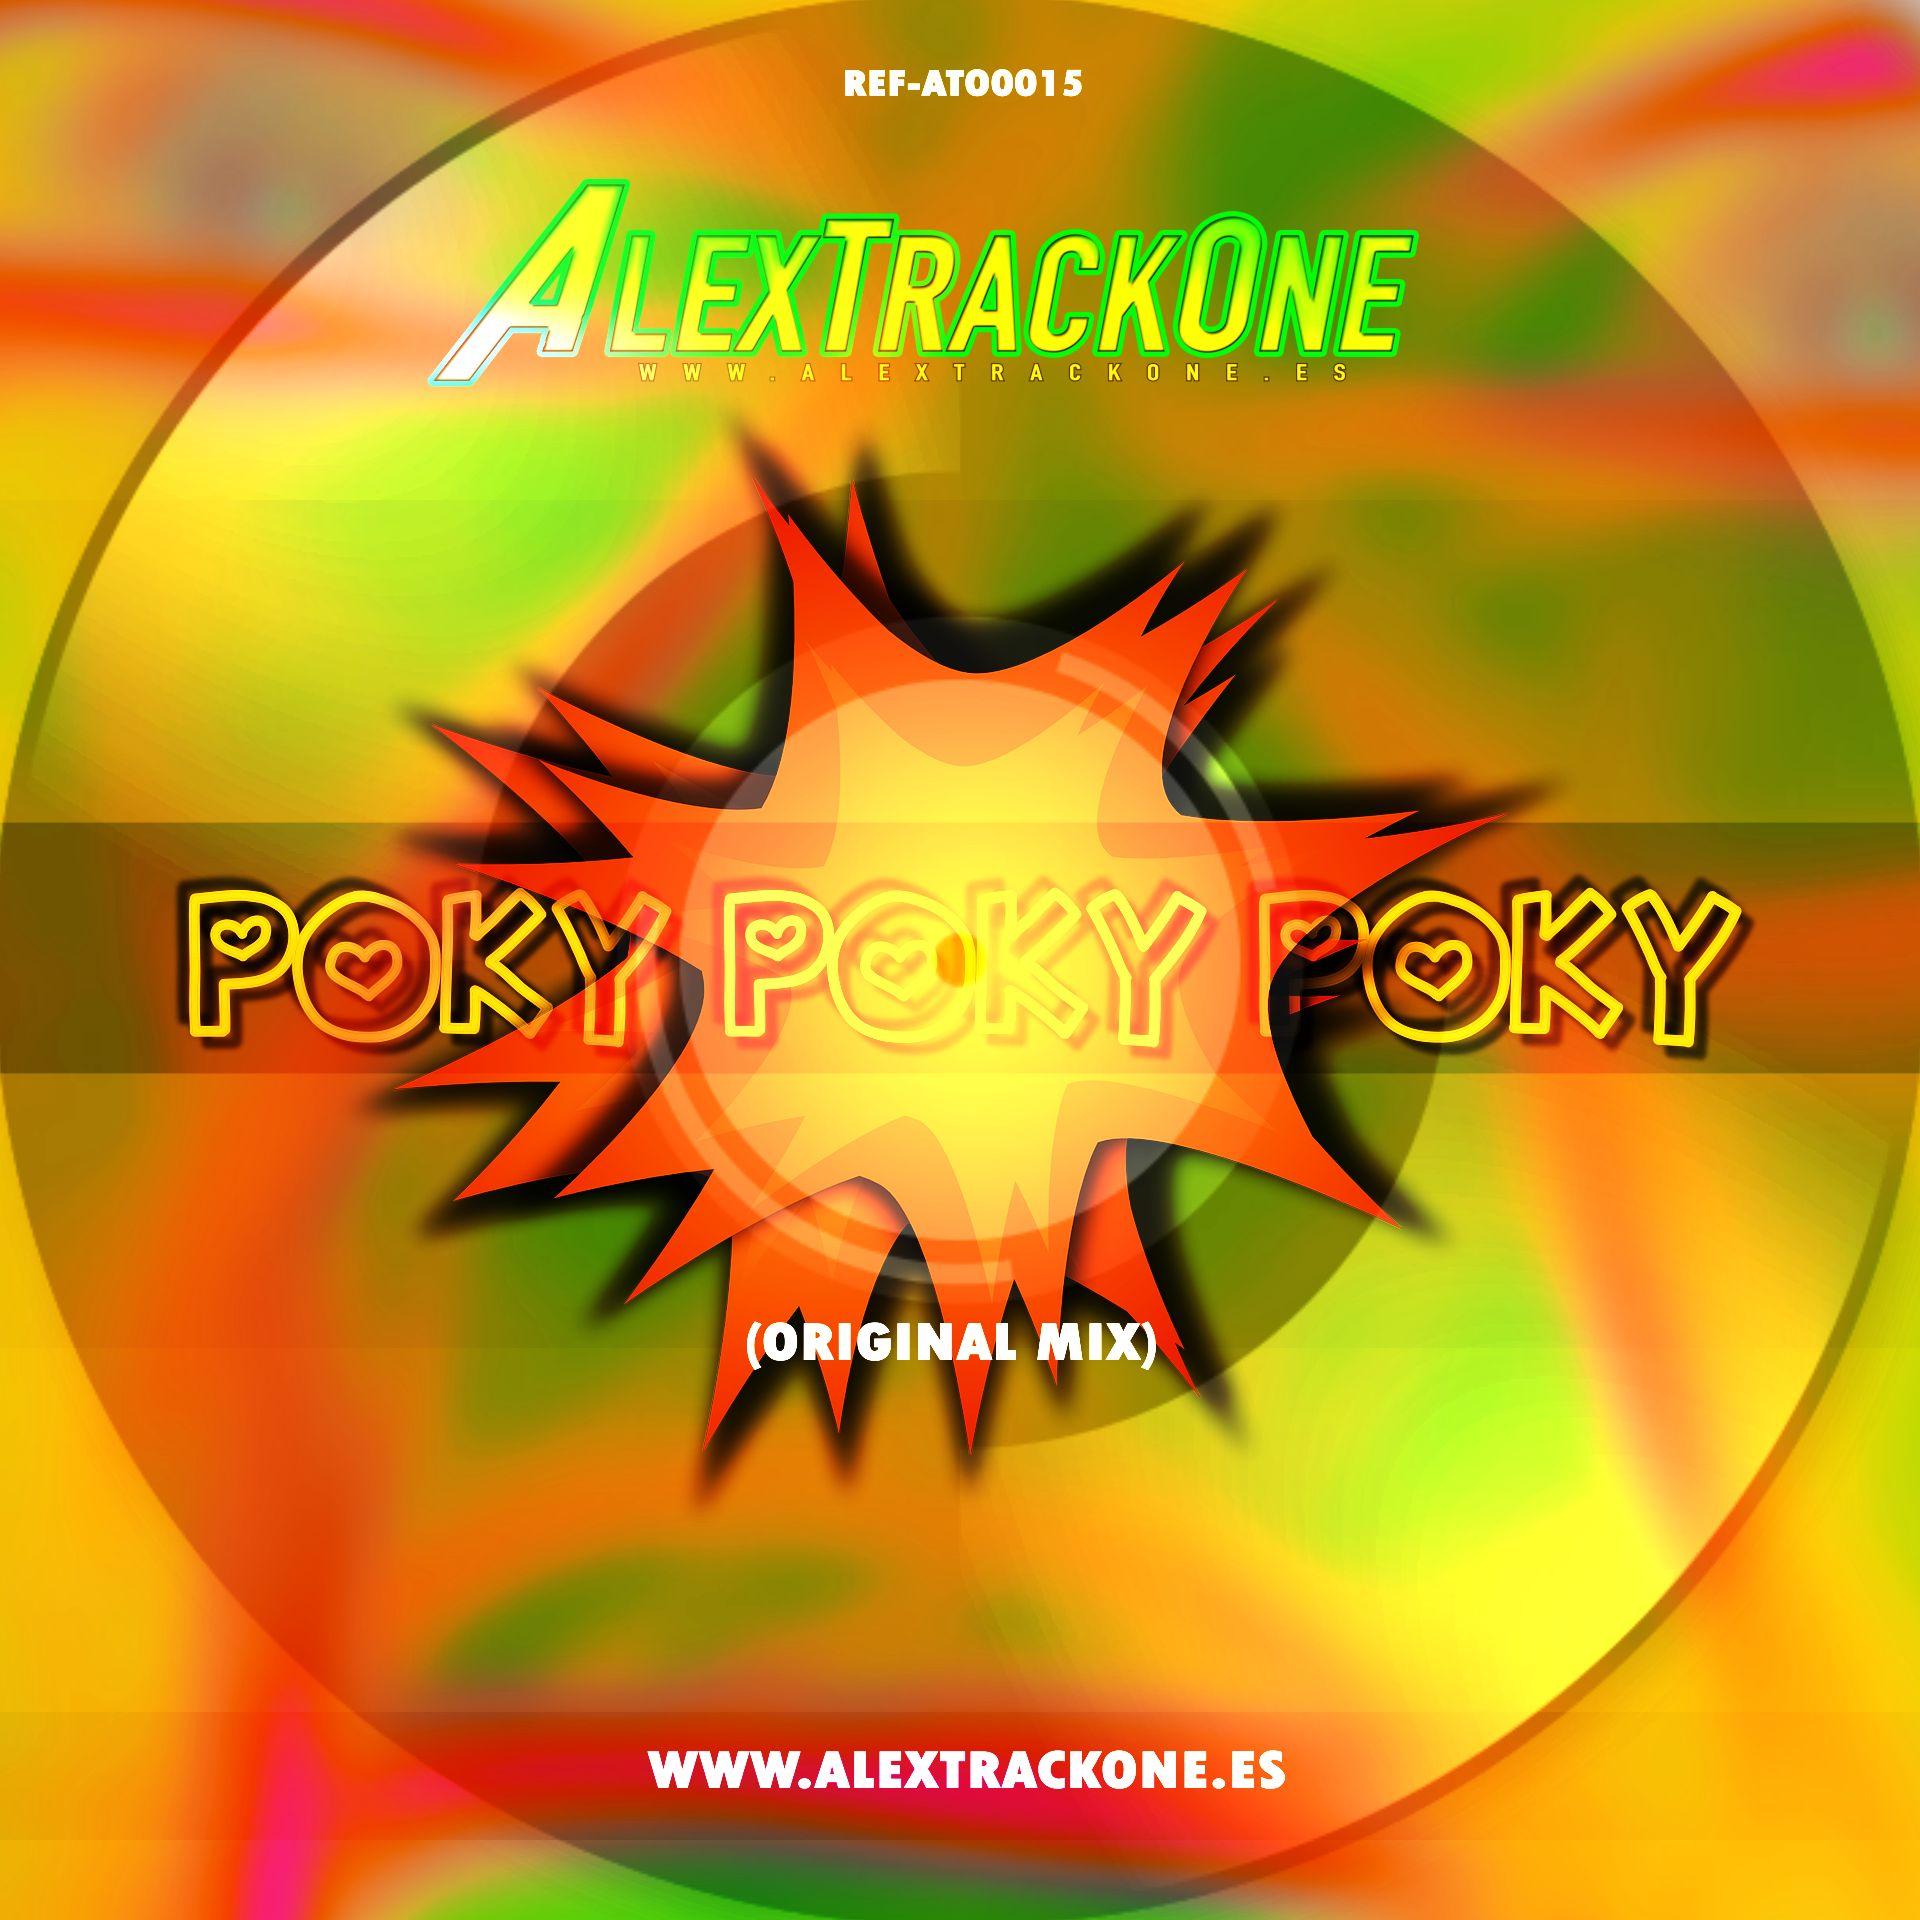 REF-ATO0015 POKY POKY POKY (ORIGINAL MIX) (MP3 & WAV)